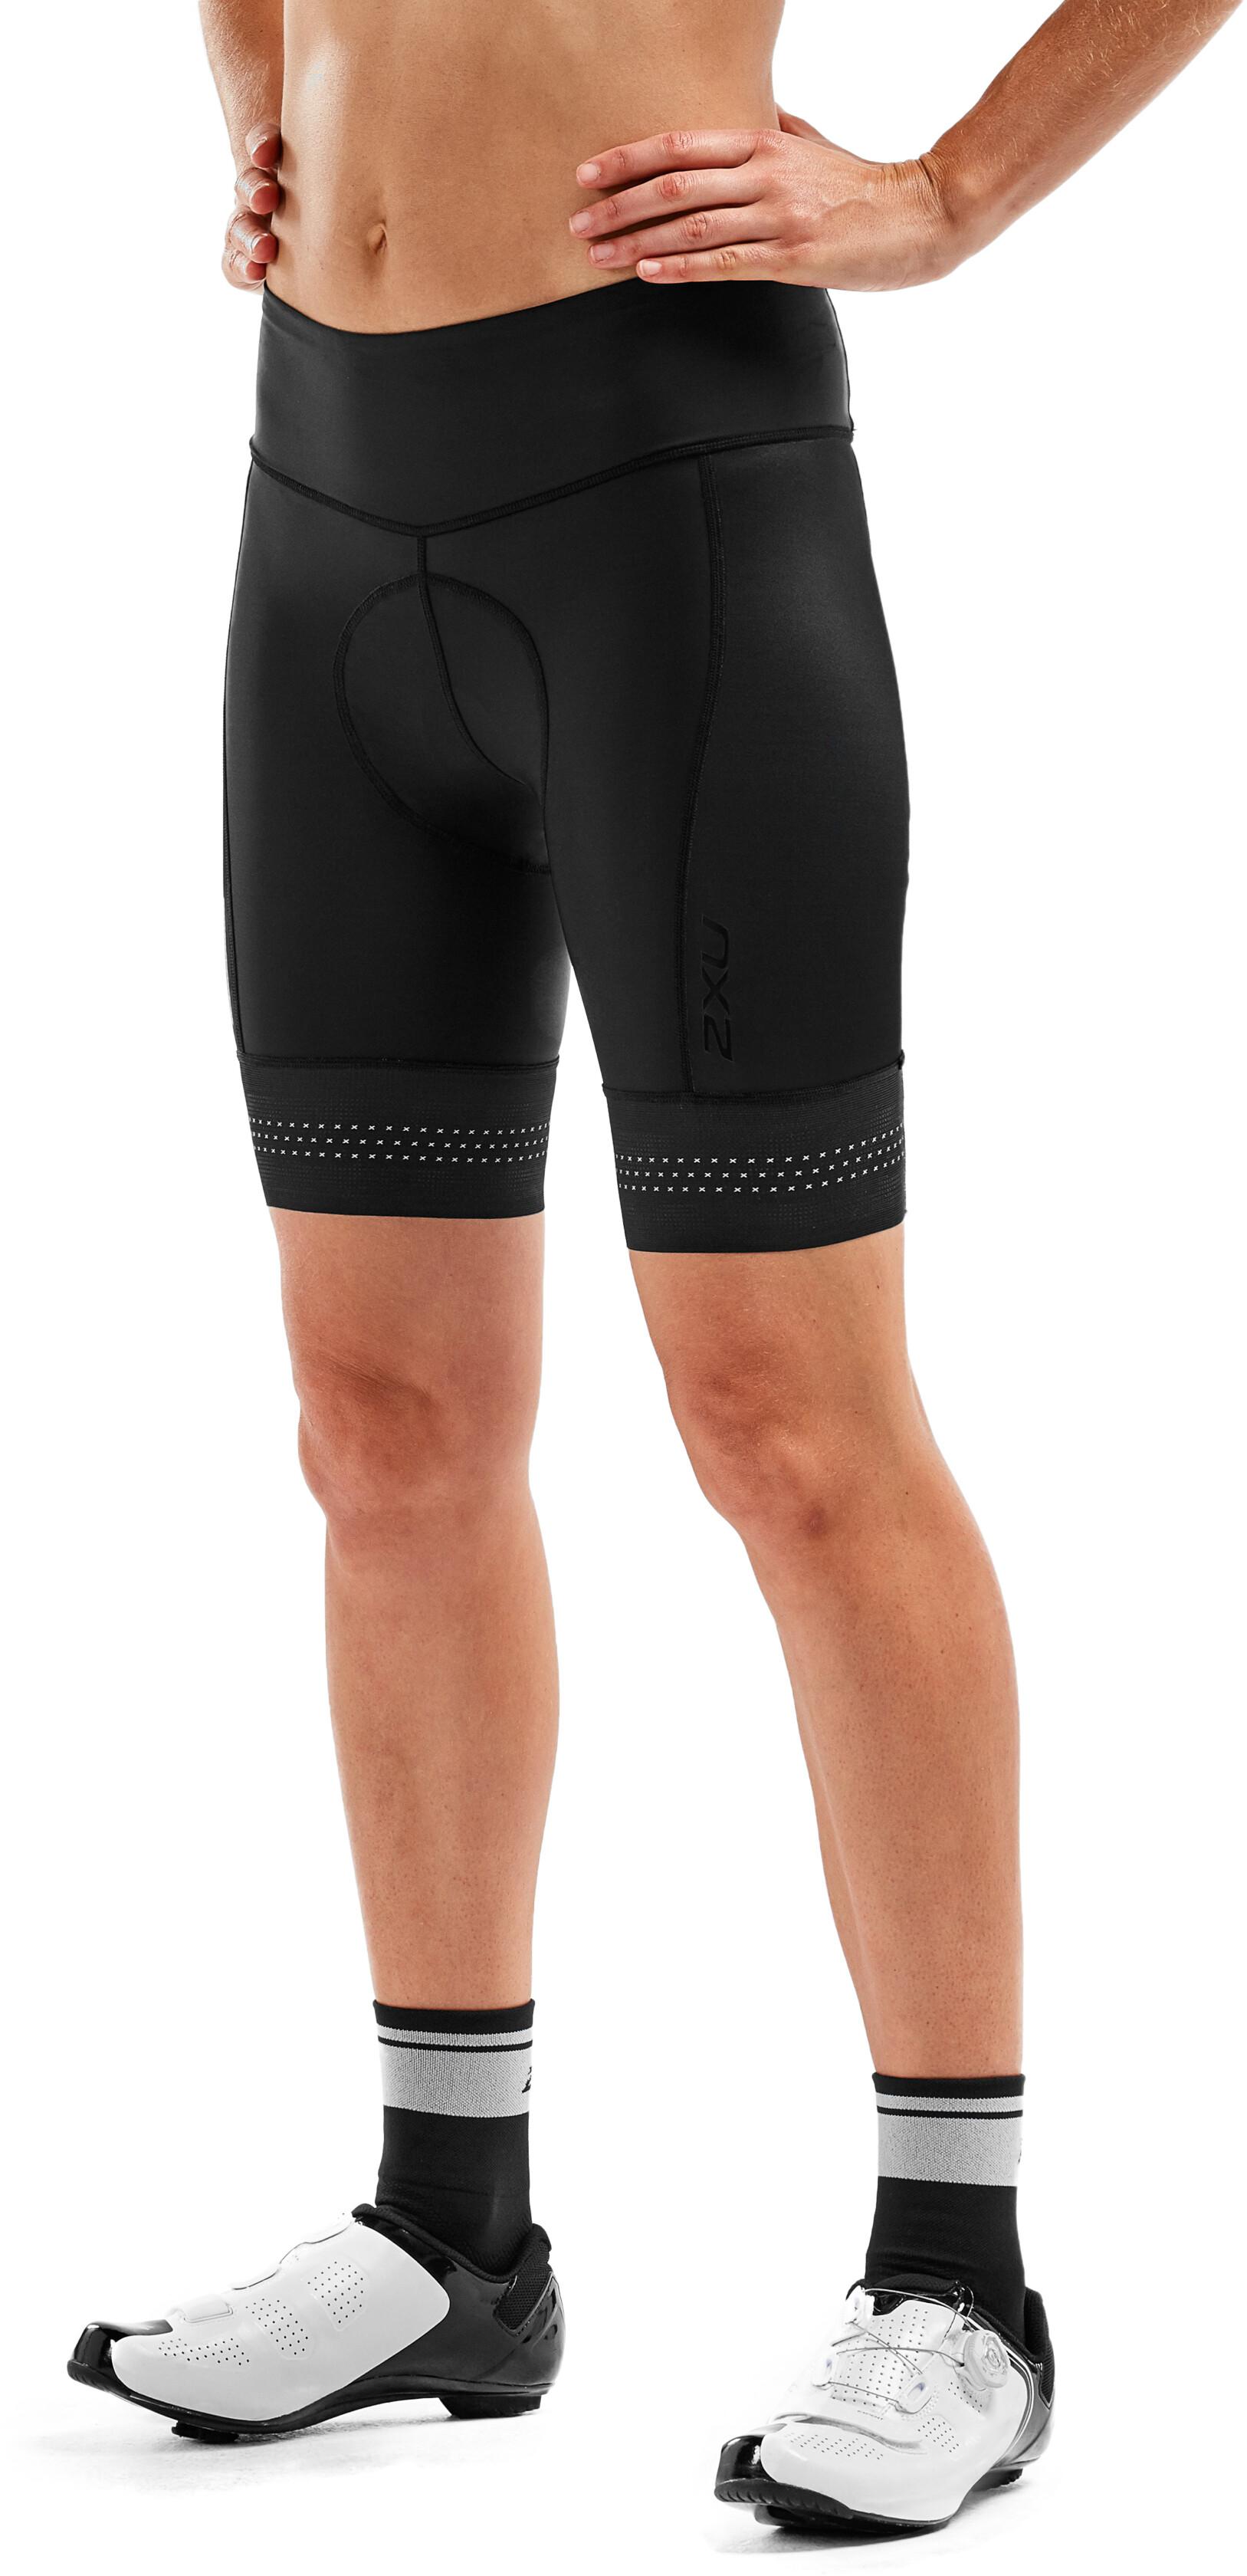 4697efd3 2XU Elite Cycle Shorts Women black/black at Bikester.co.uk